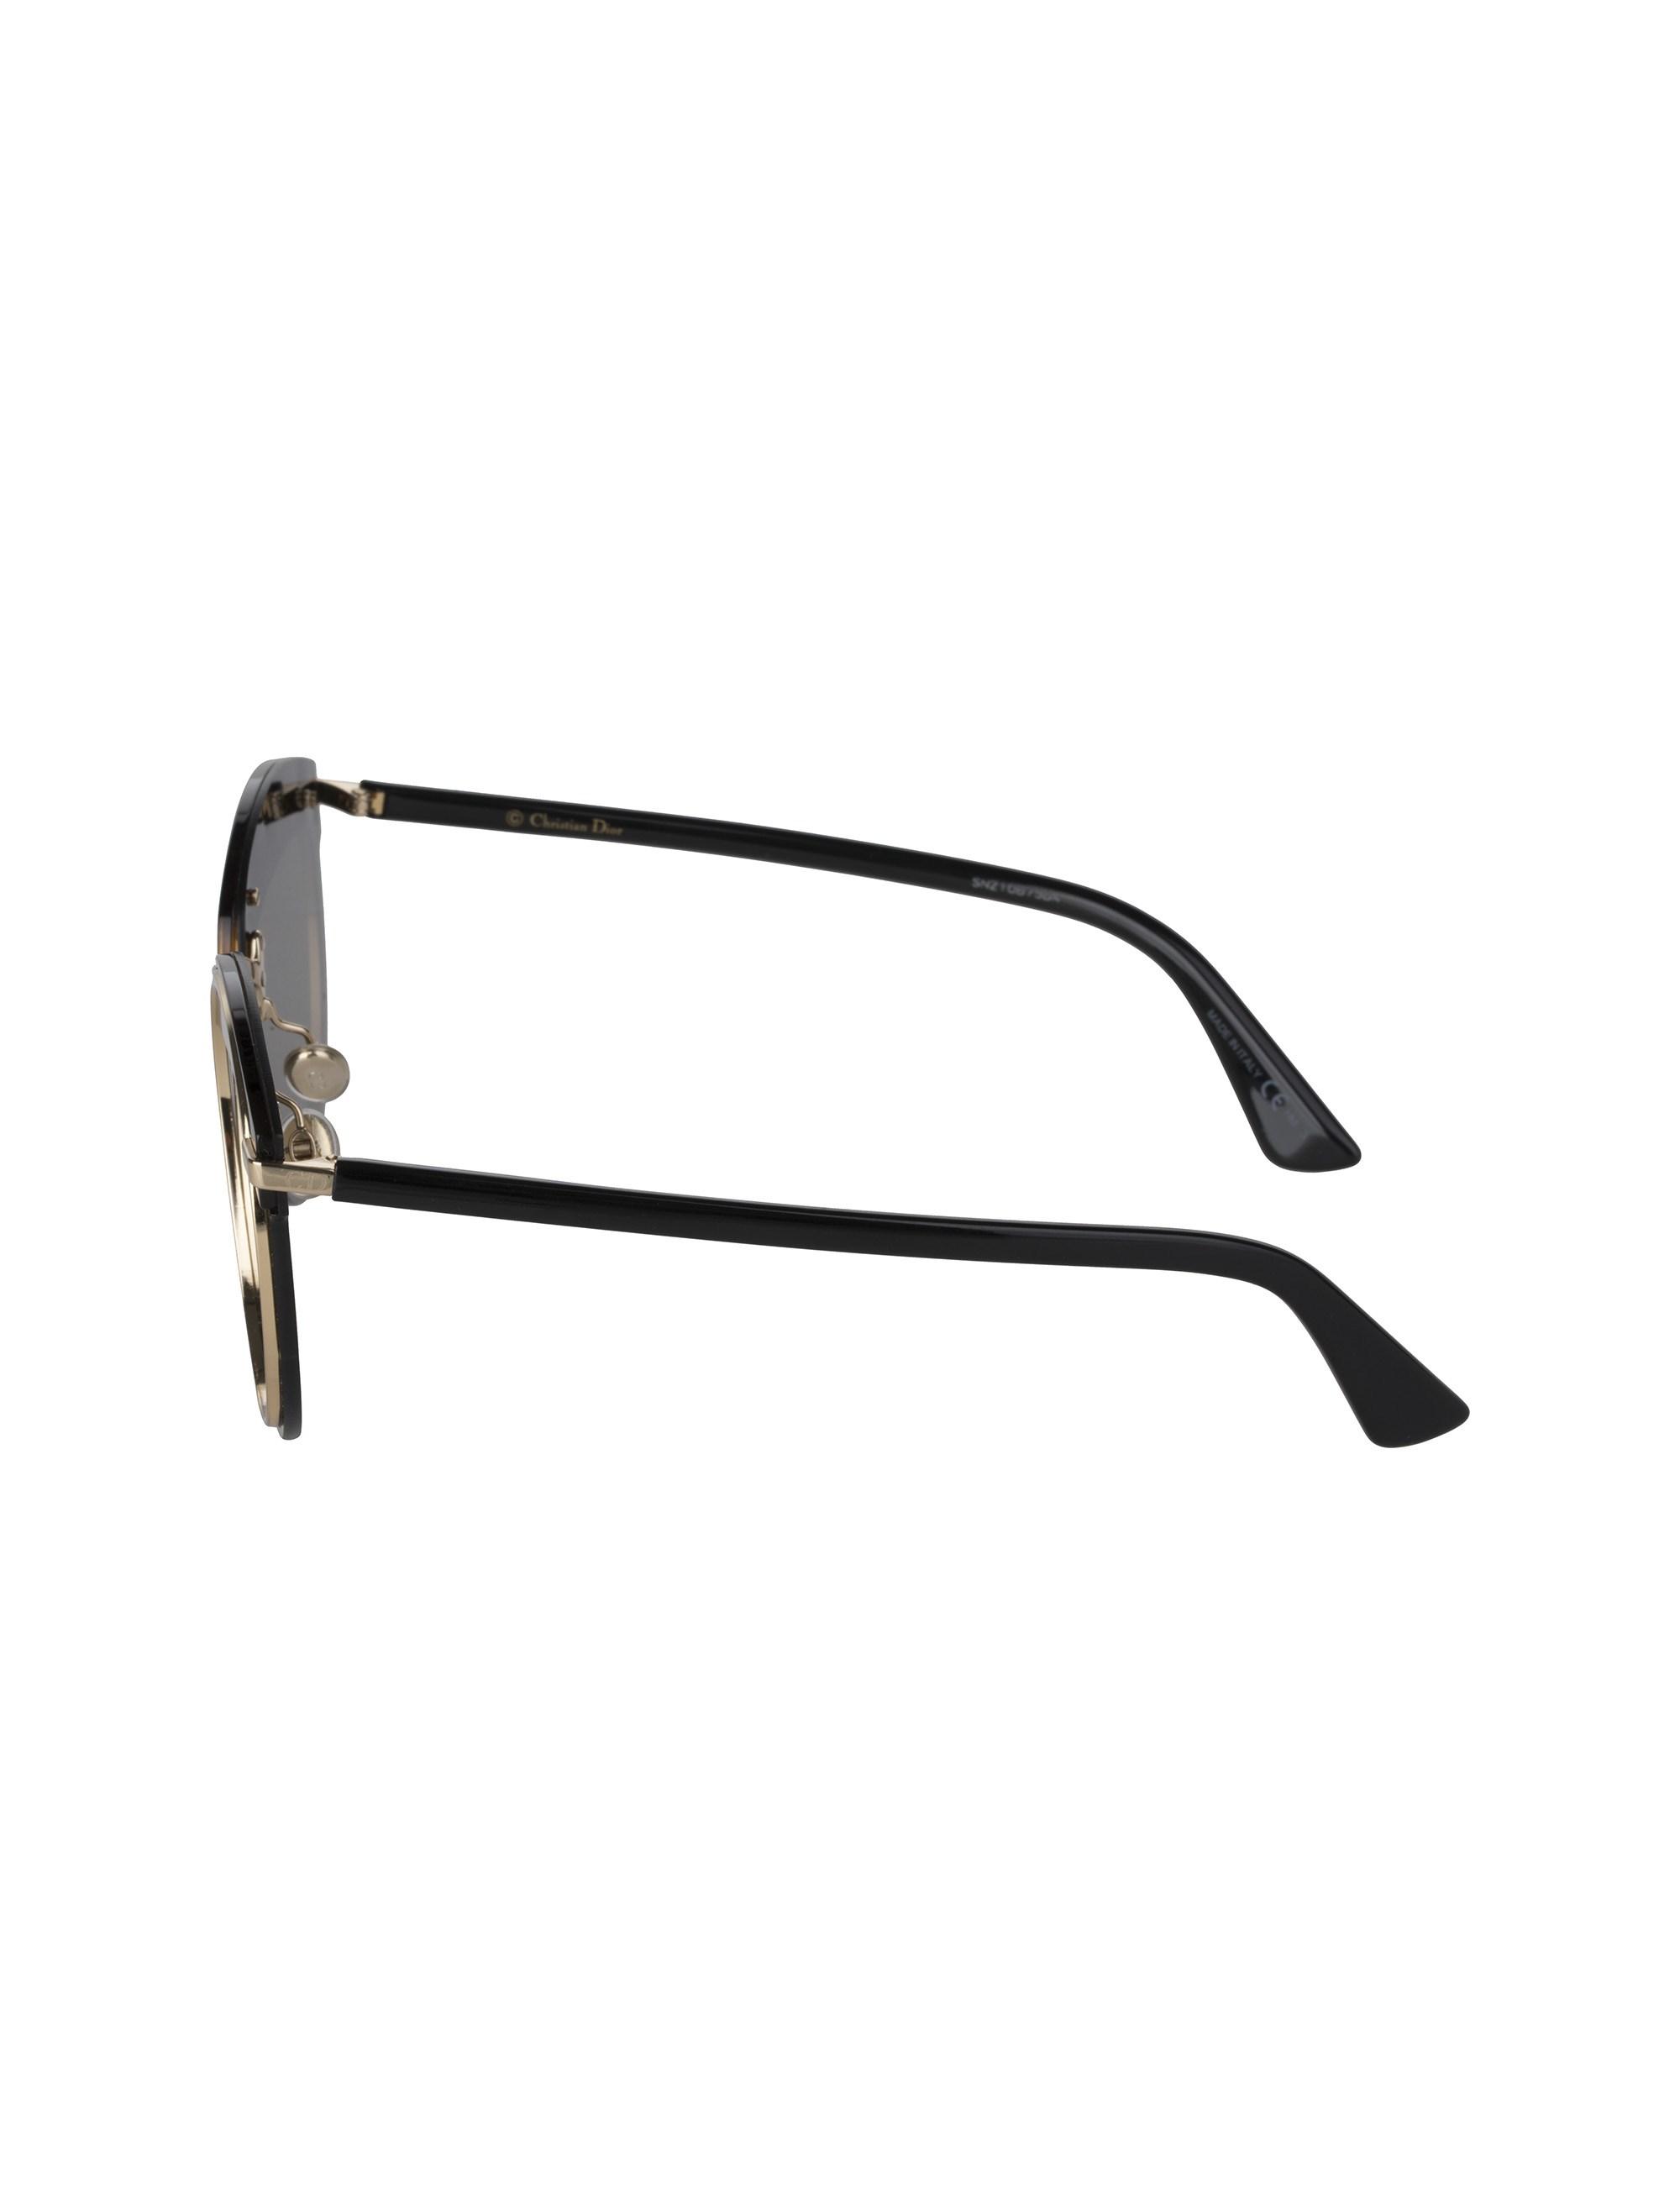 عینک آفتابی پنتوس زنانه - دیور - مشکي لاک پشتي - 3